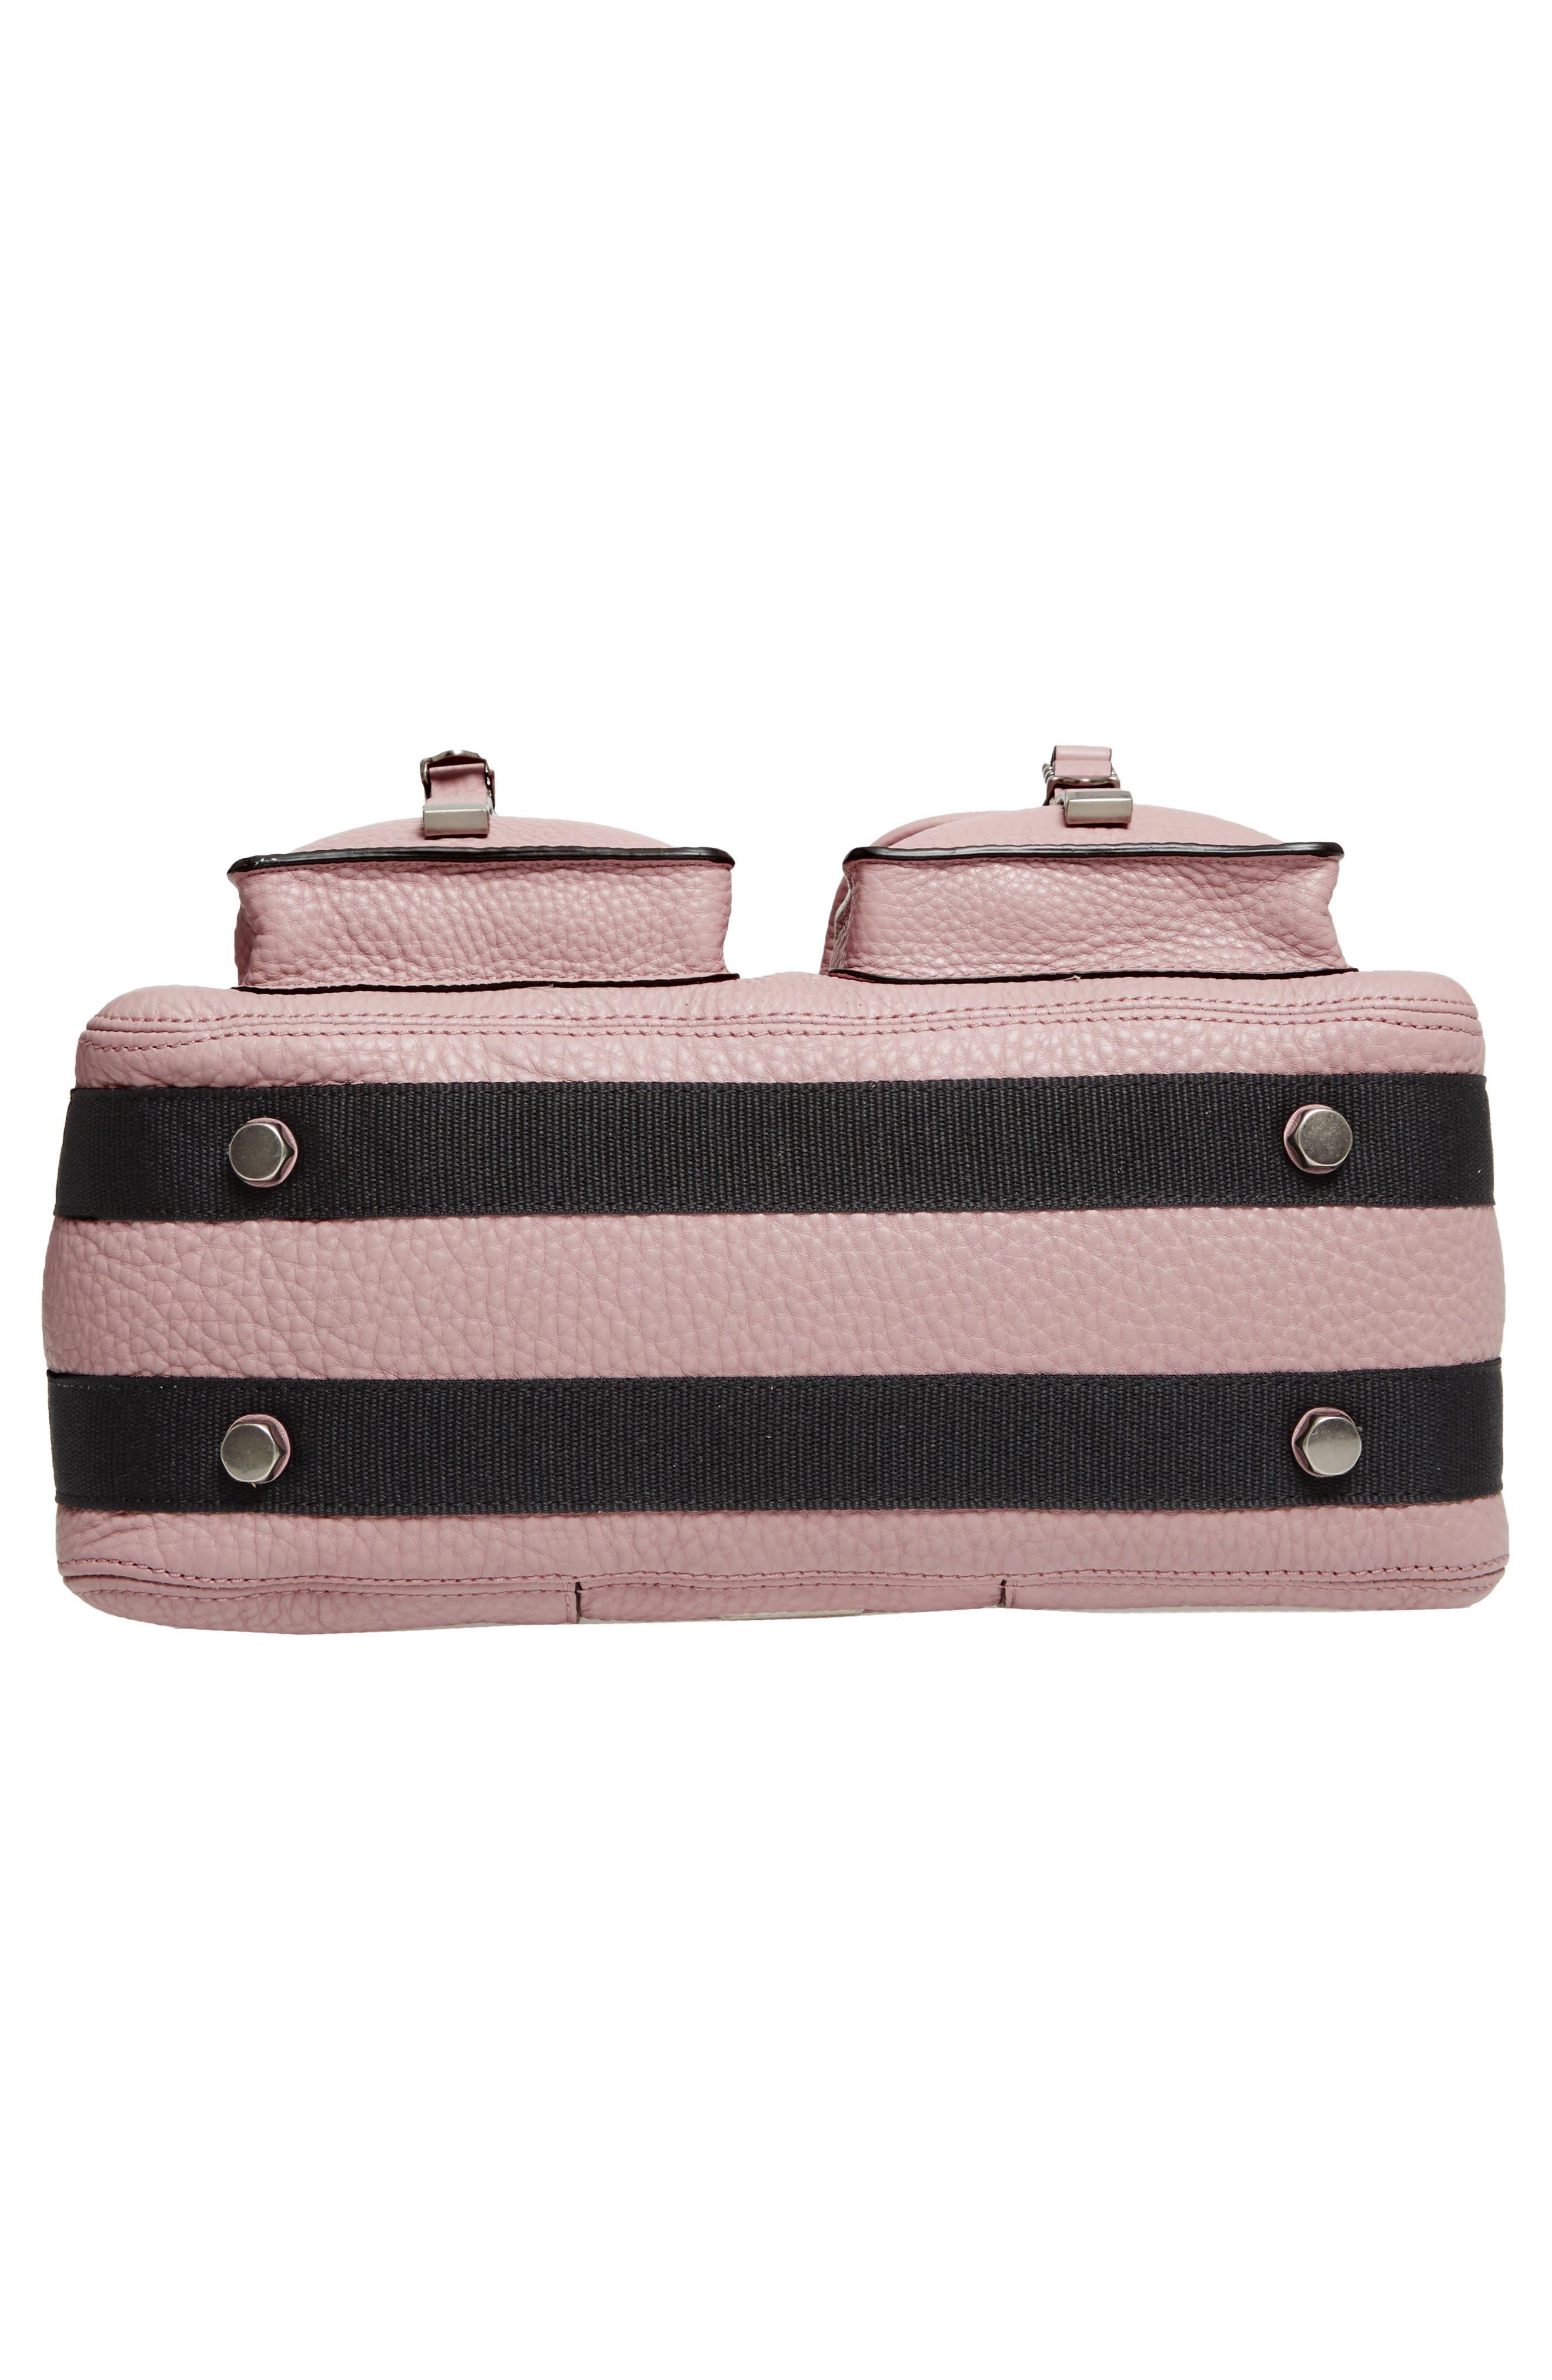 Military Pocket Leather Satchel,                             Alternate thumbnail 6, color,                             Vintage Pink